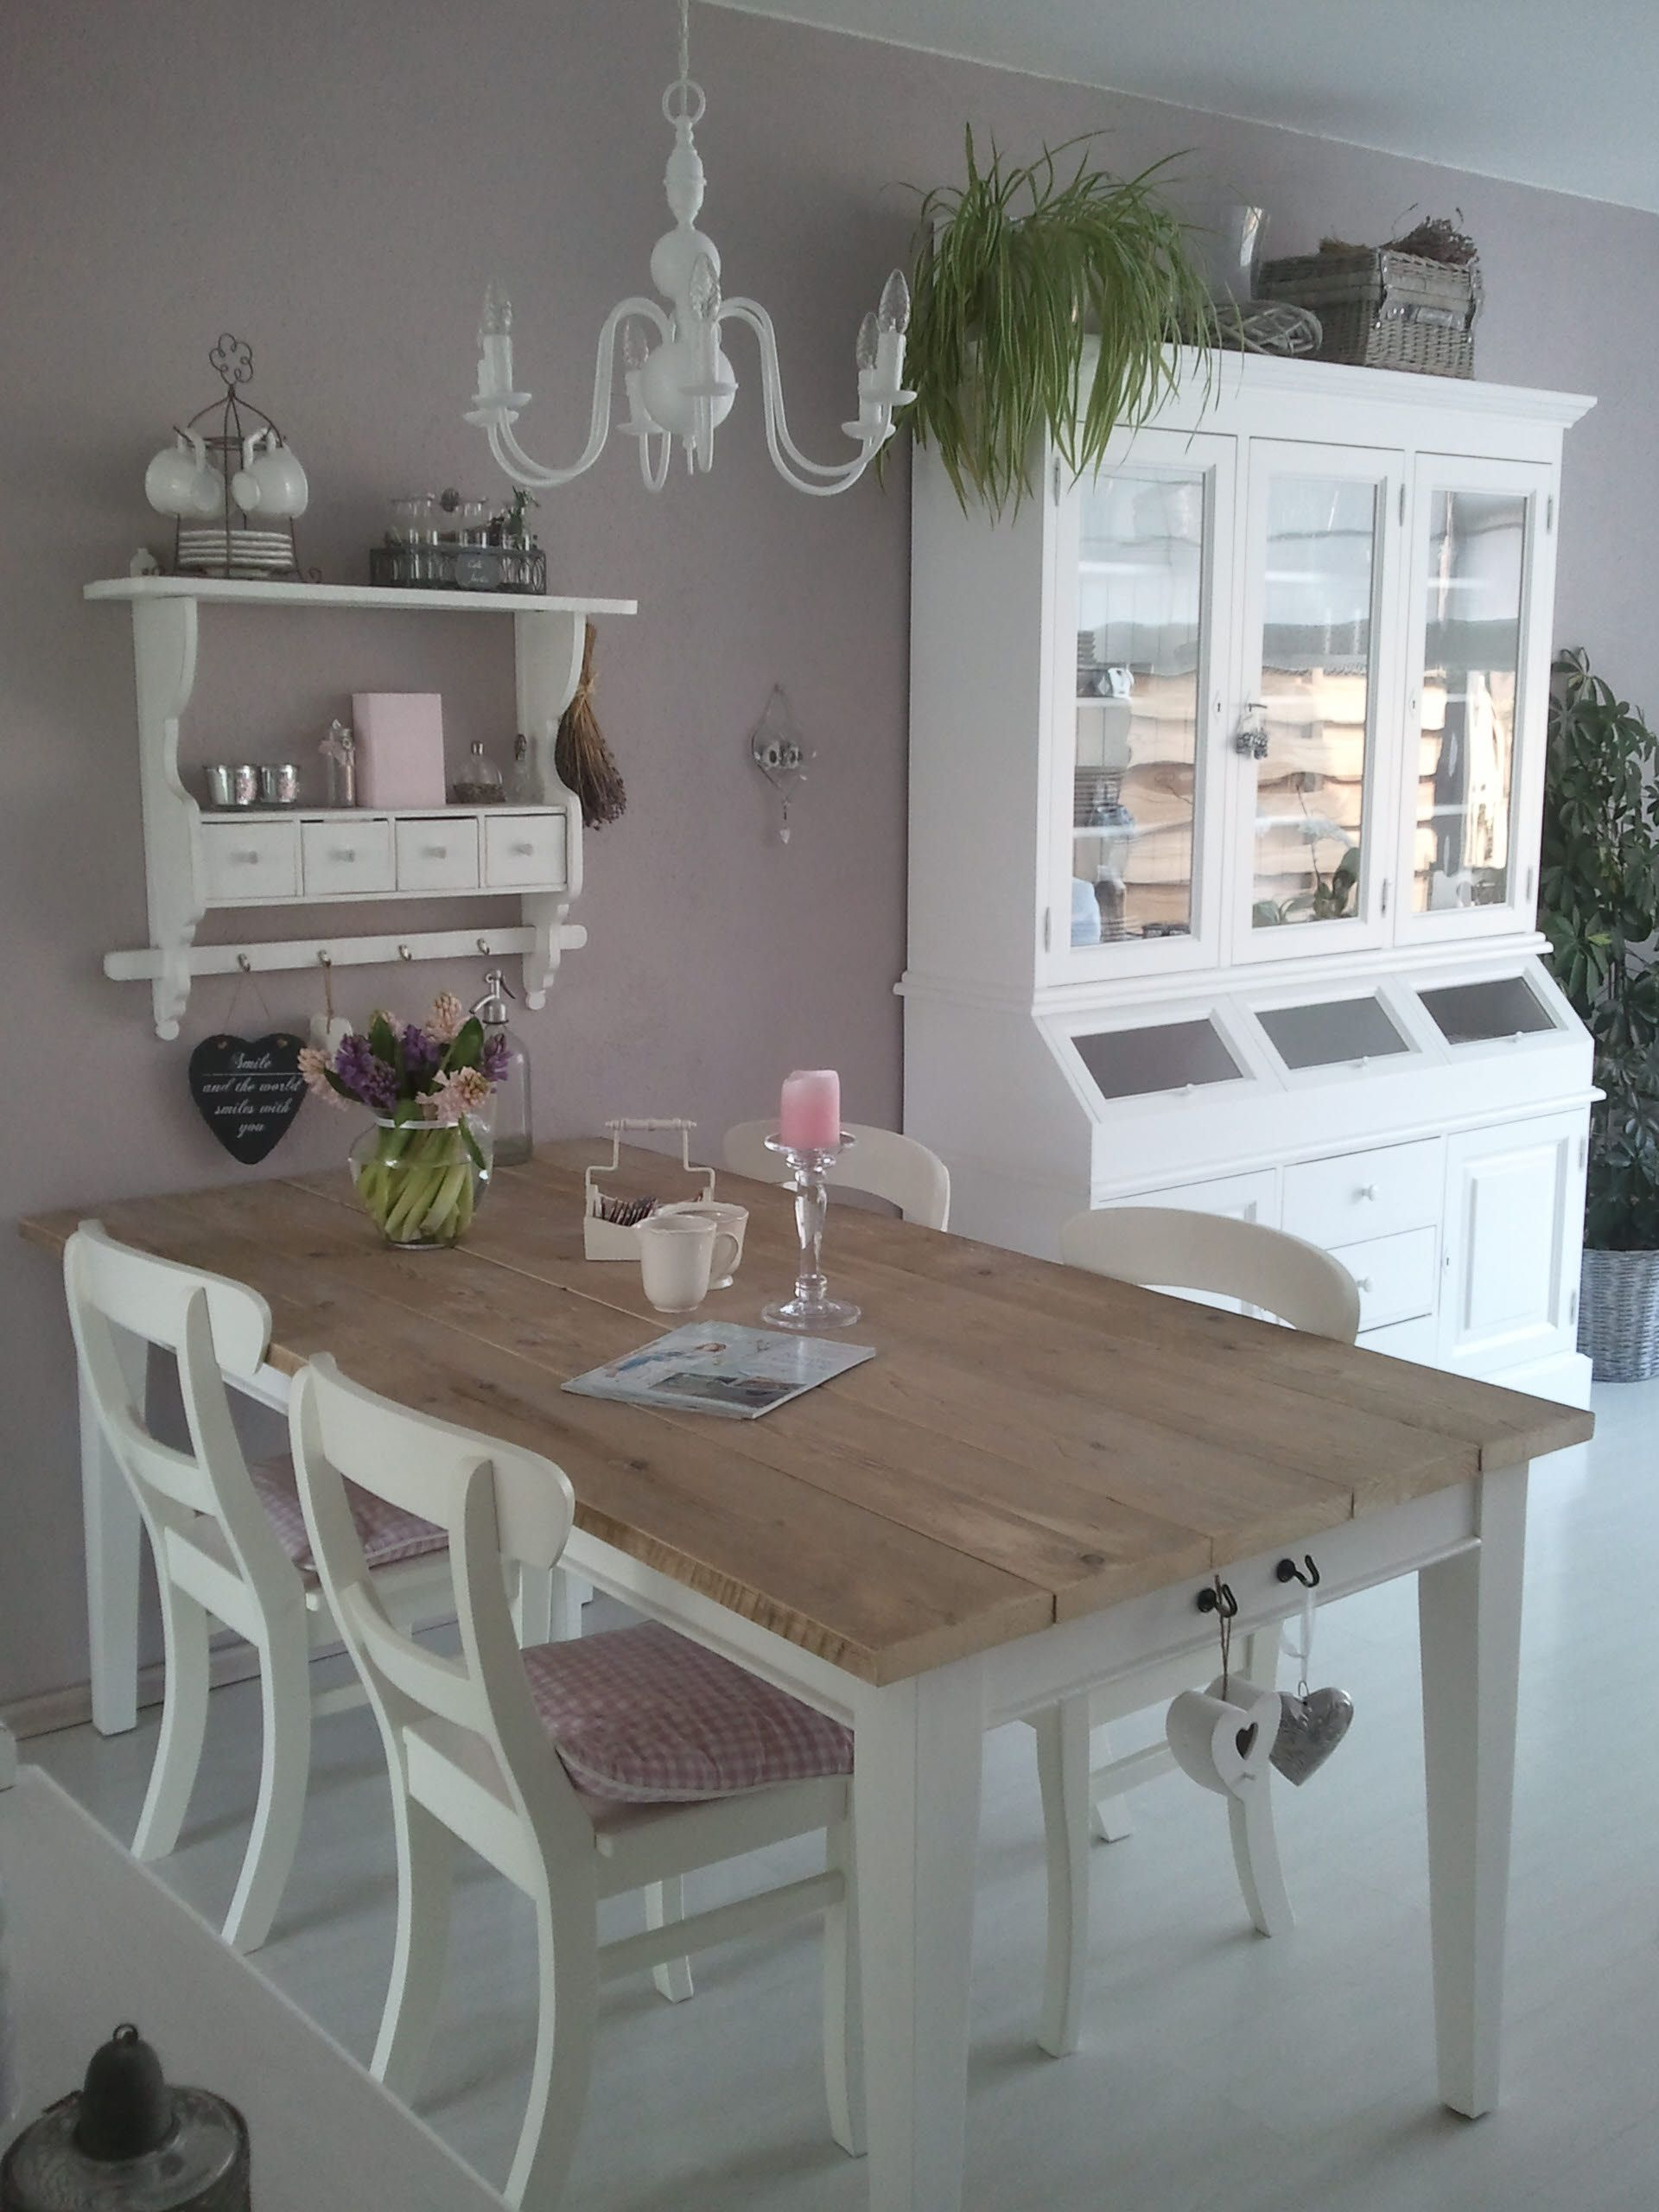 Landelijke stijl keuken woonkamer home inspiration for Landelijke stijl interieur